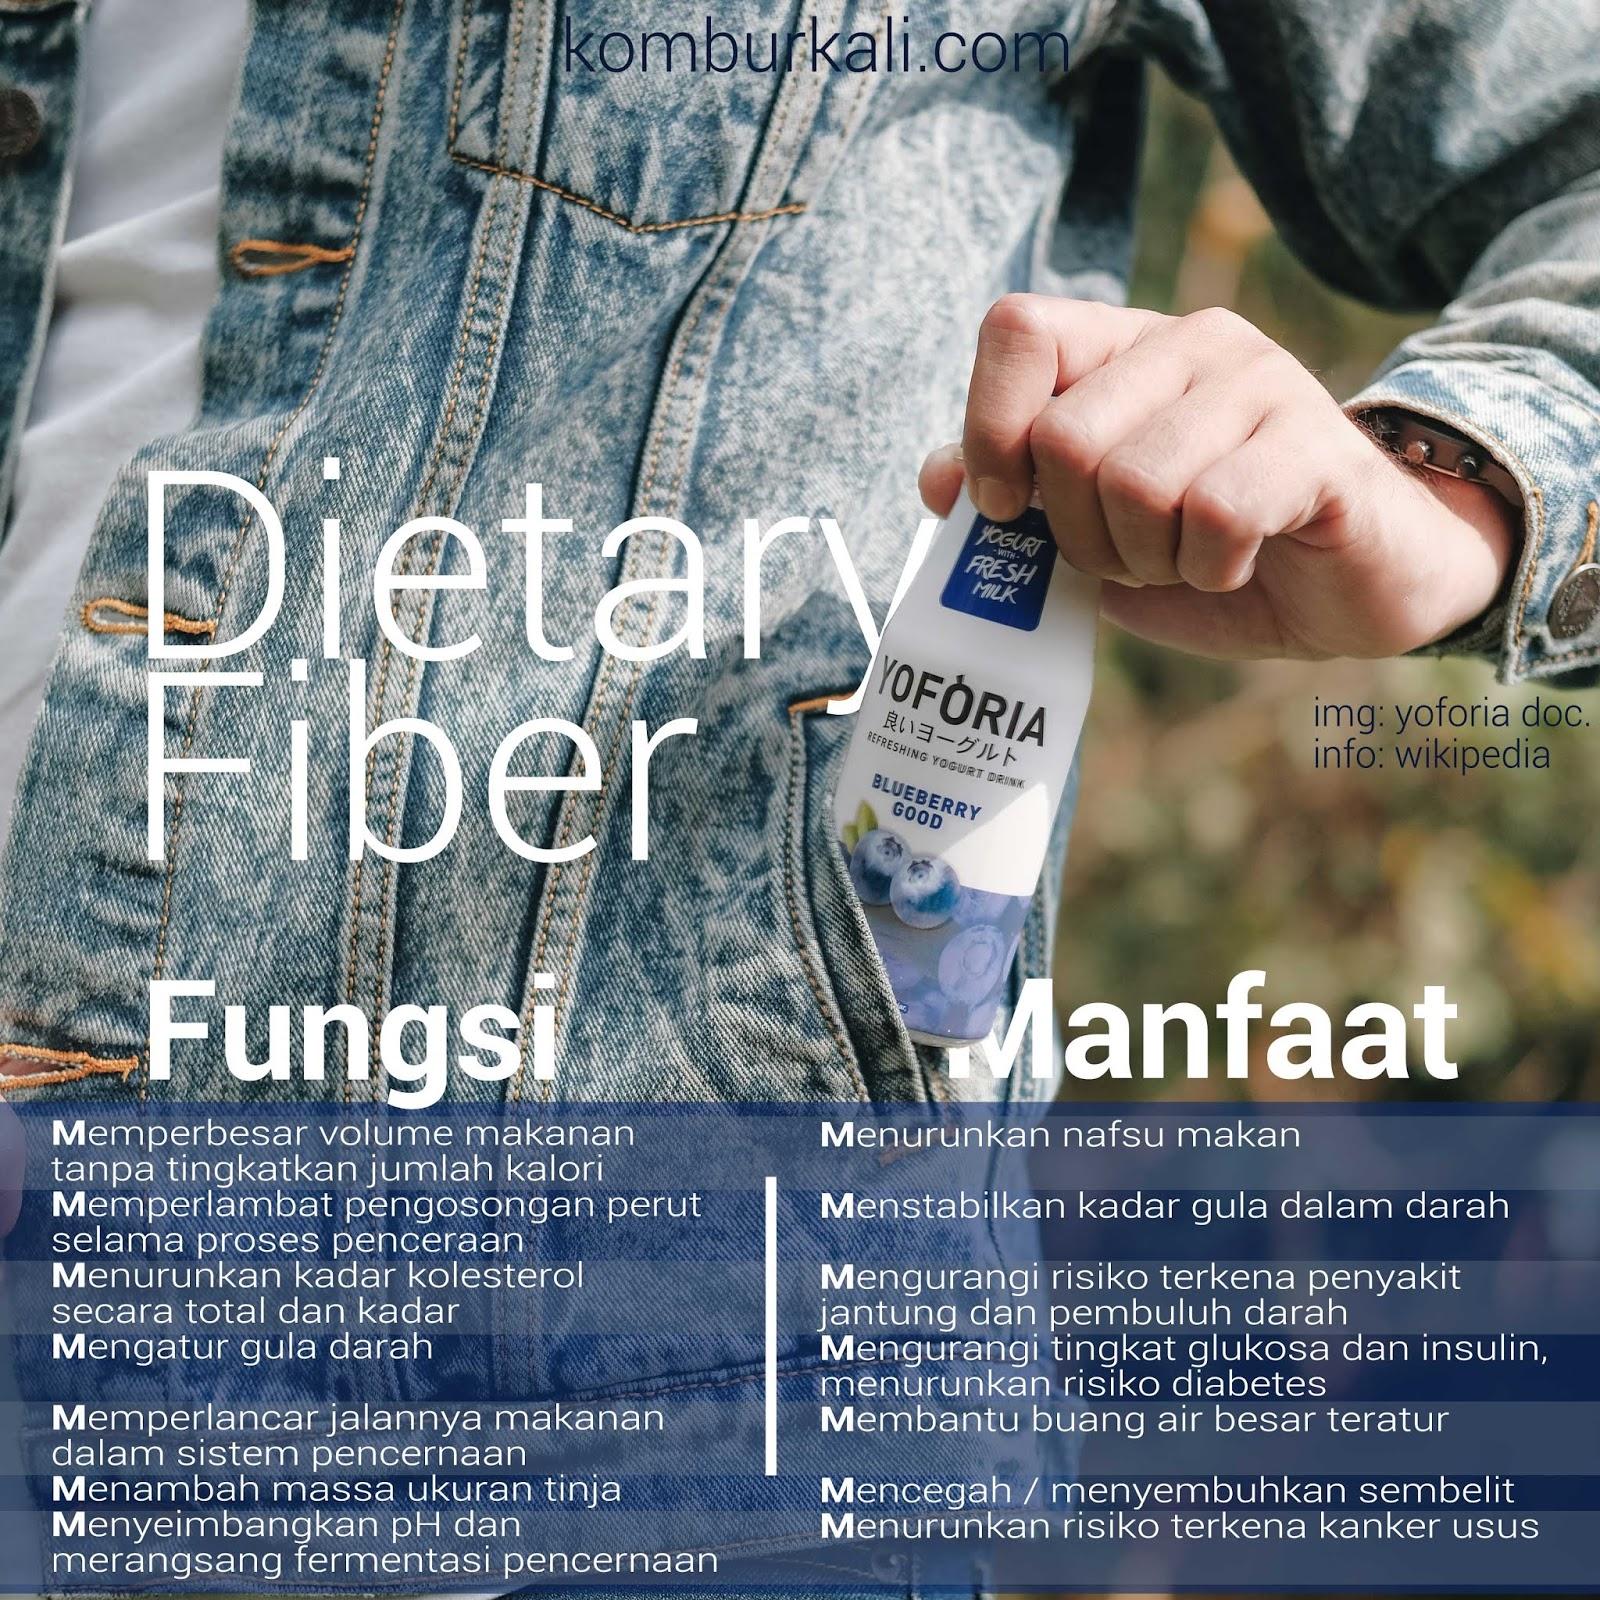 yoforia yogurt review, manfaat dietary fiber, manfaat yoforia yogurt